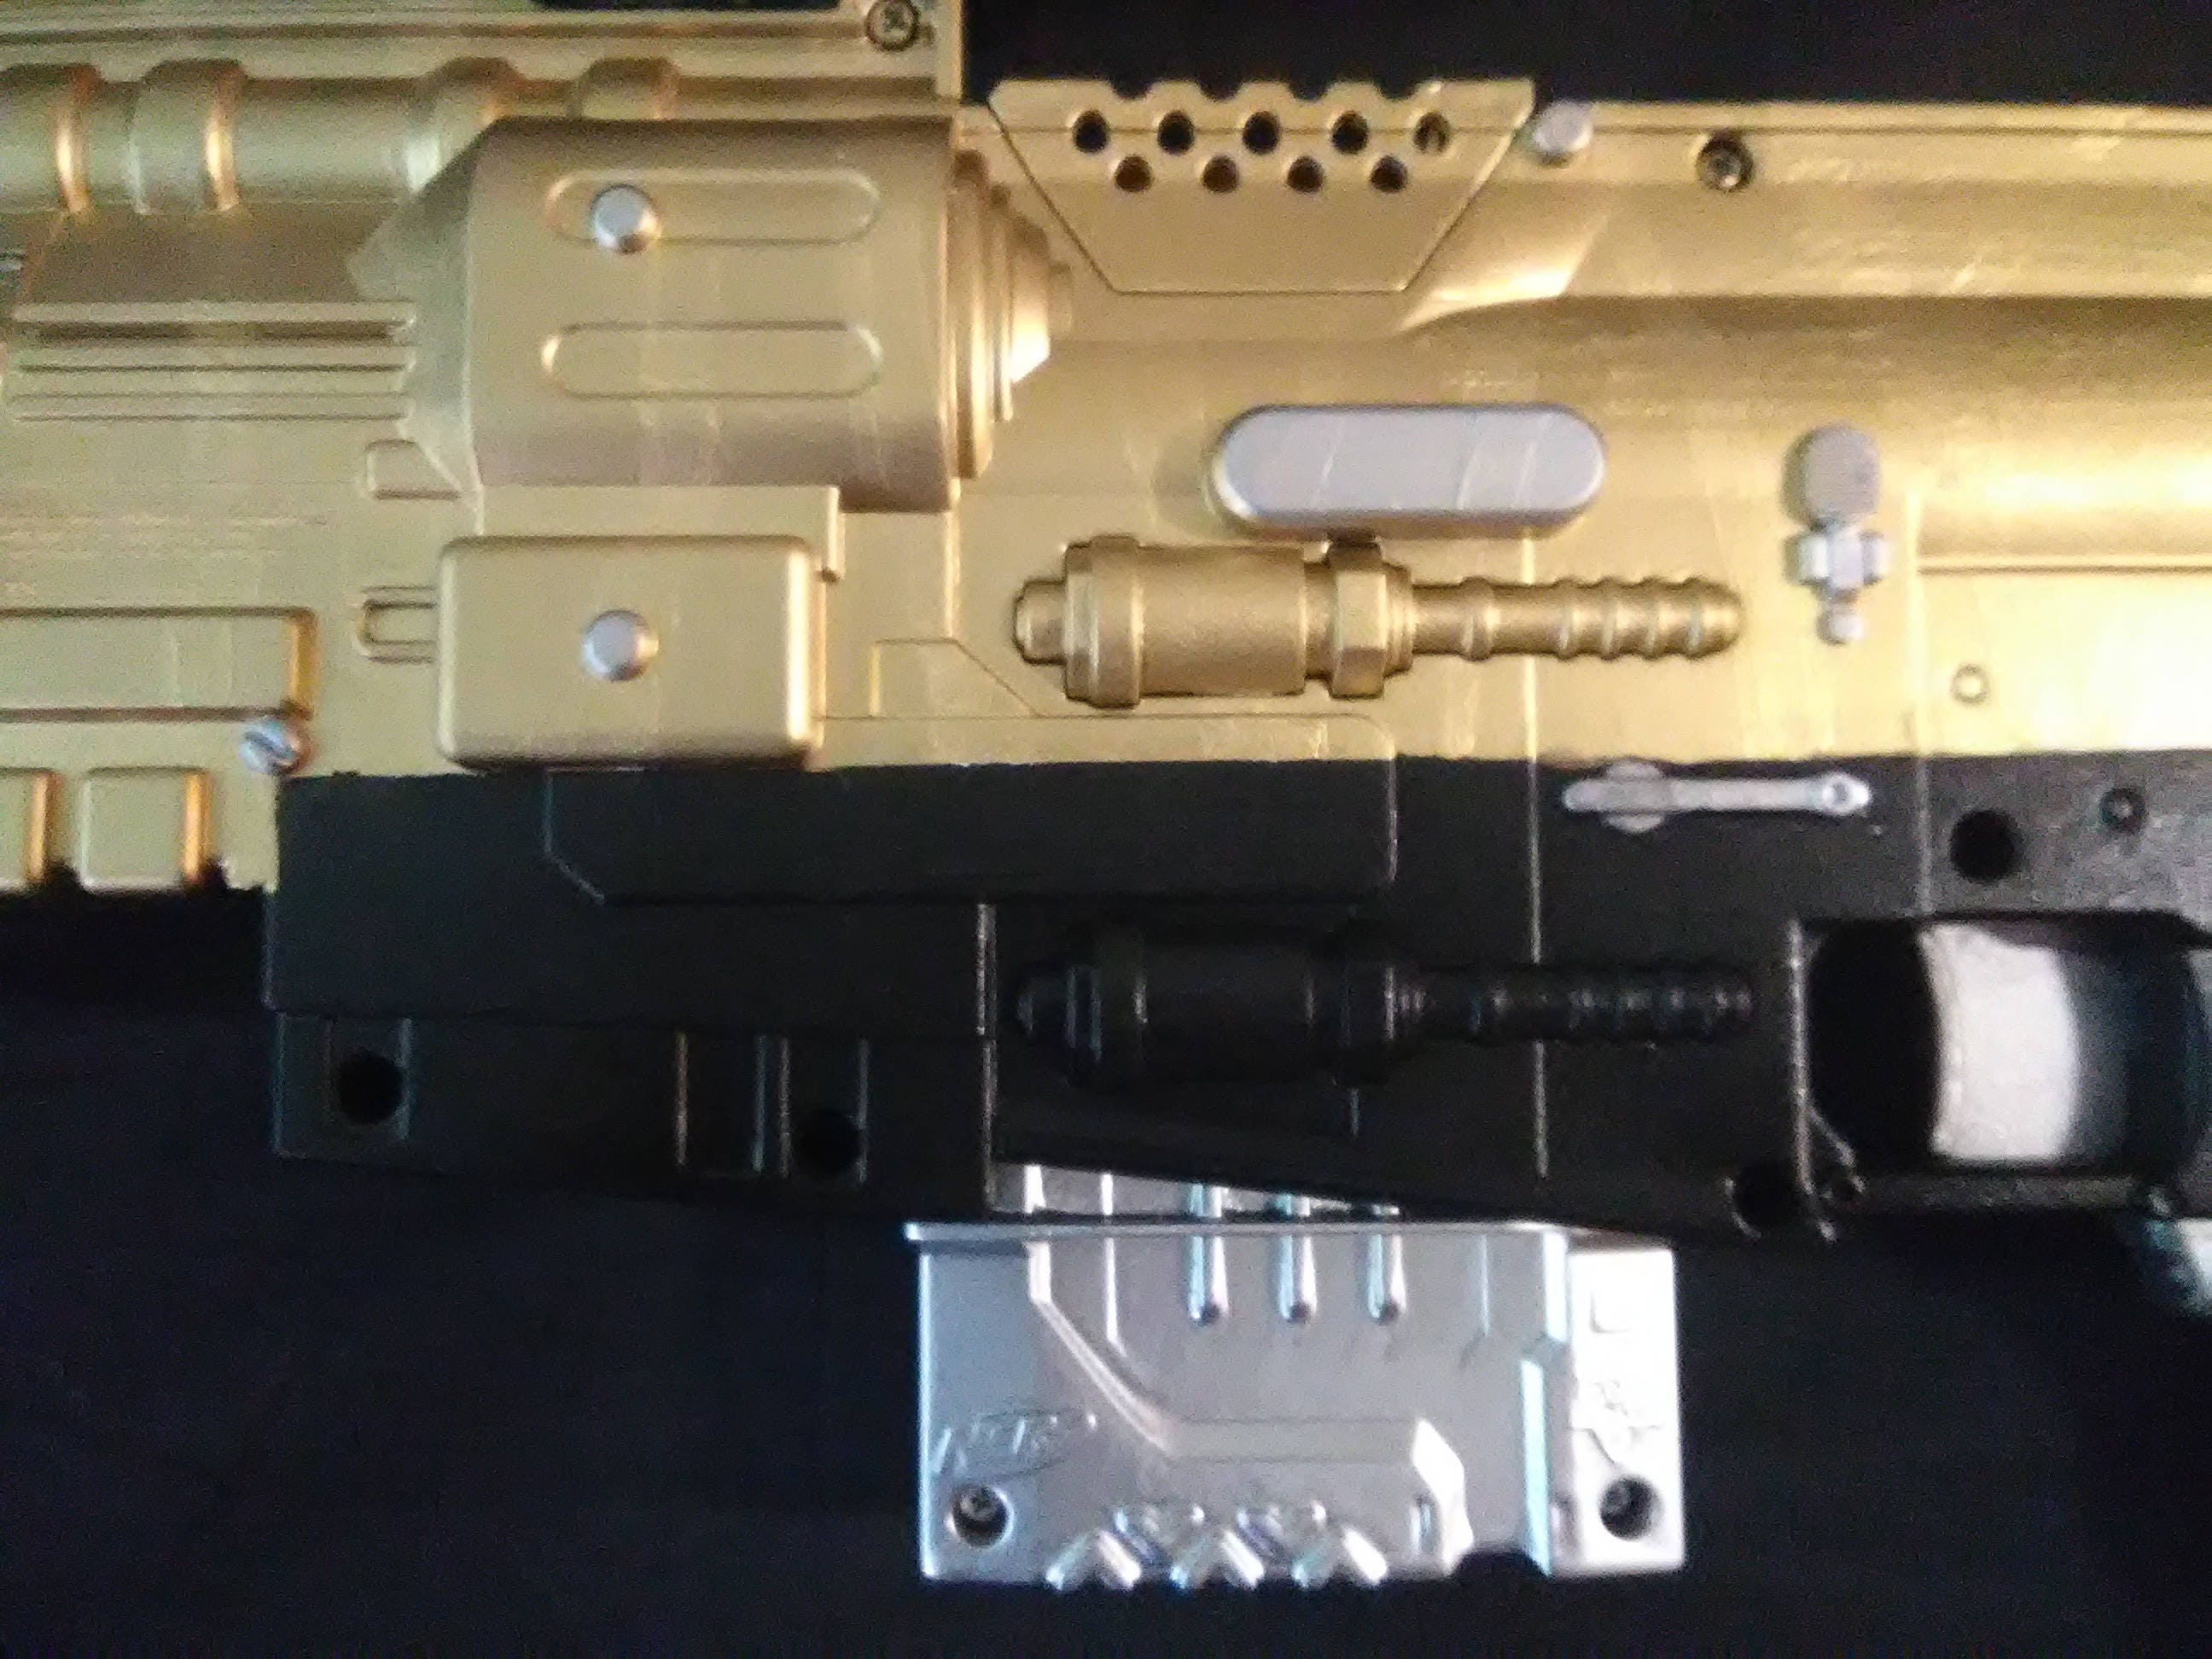 Named weapon Tenebrae replica nerf prop